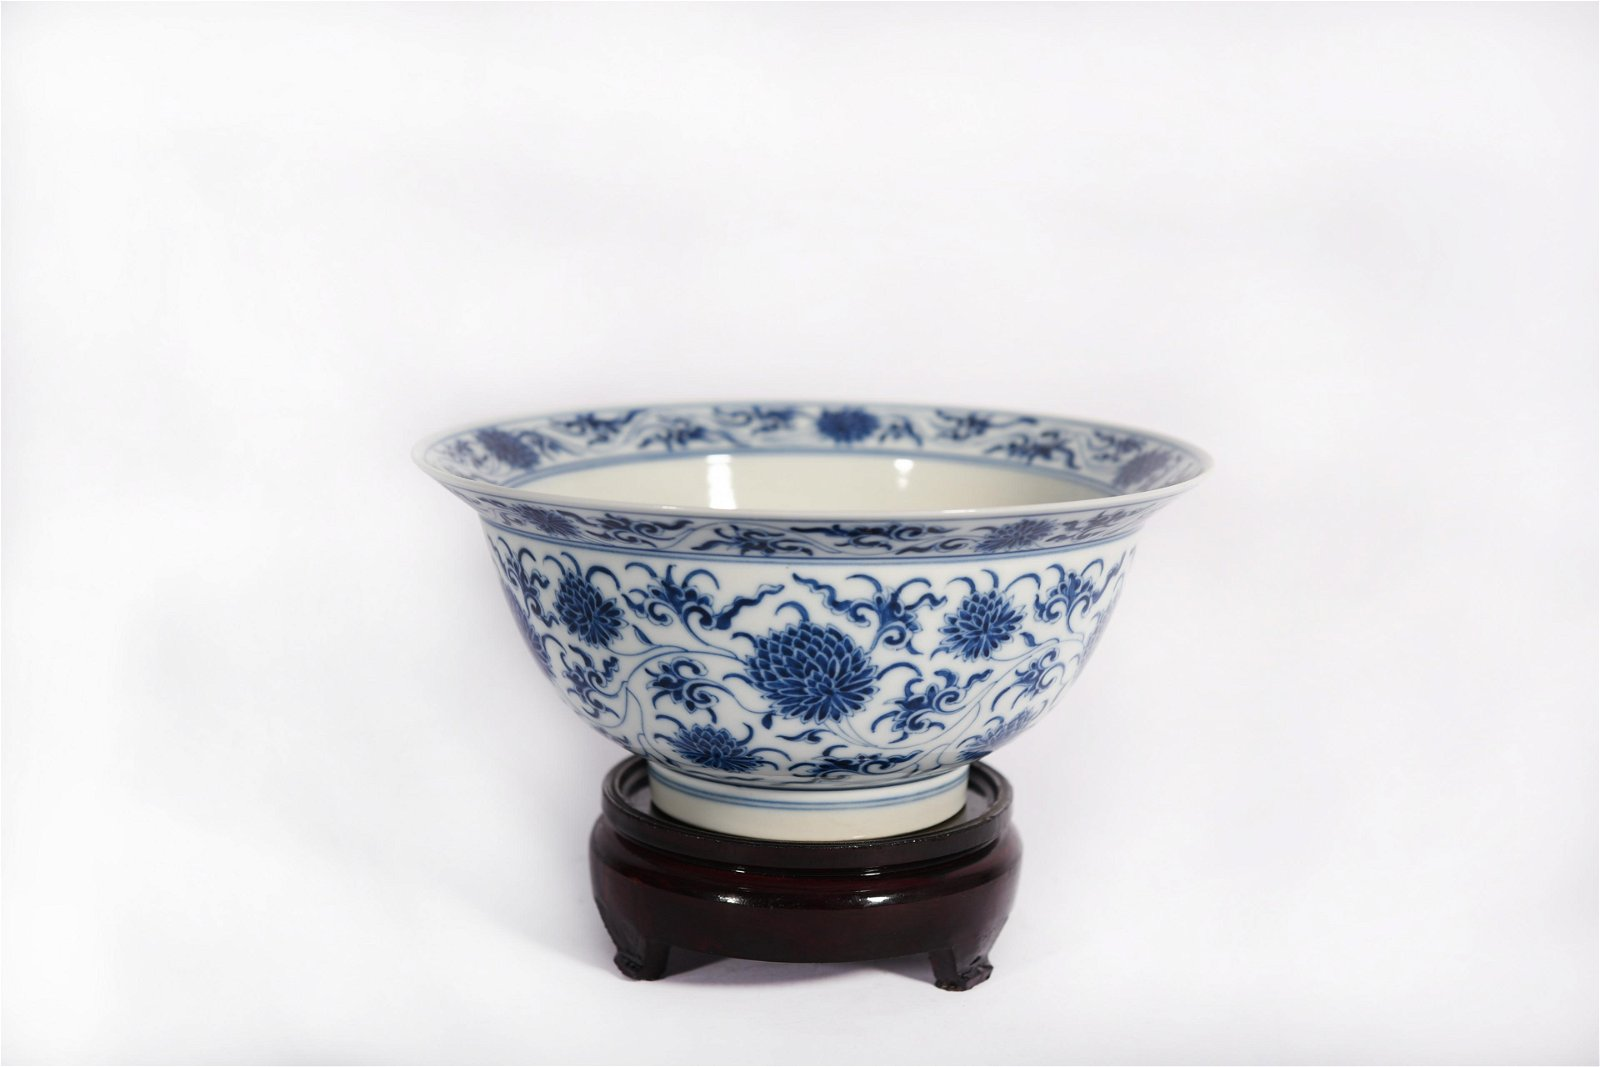 A Blue and White Bowl Kangxi Period